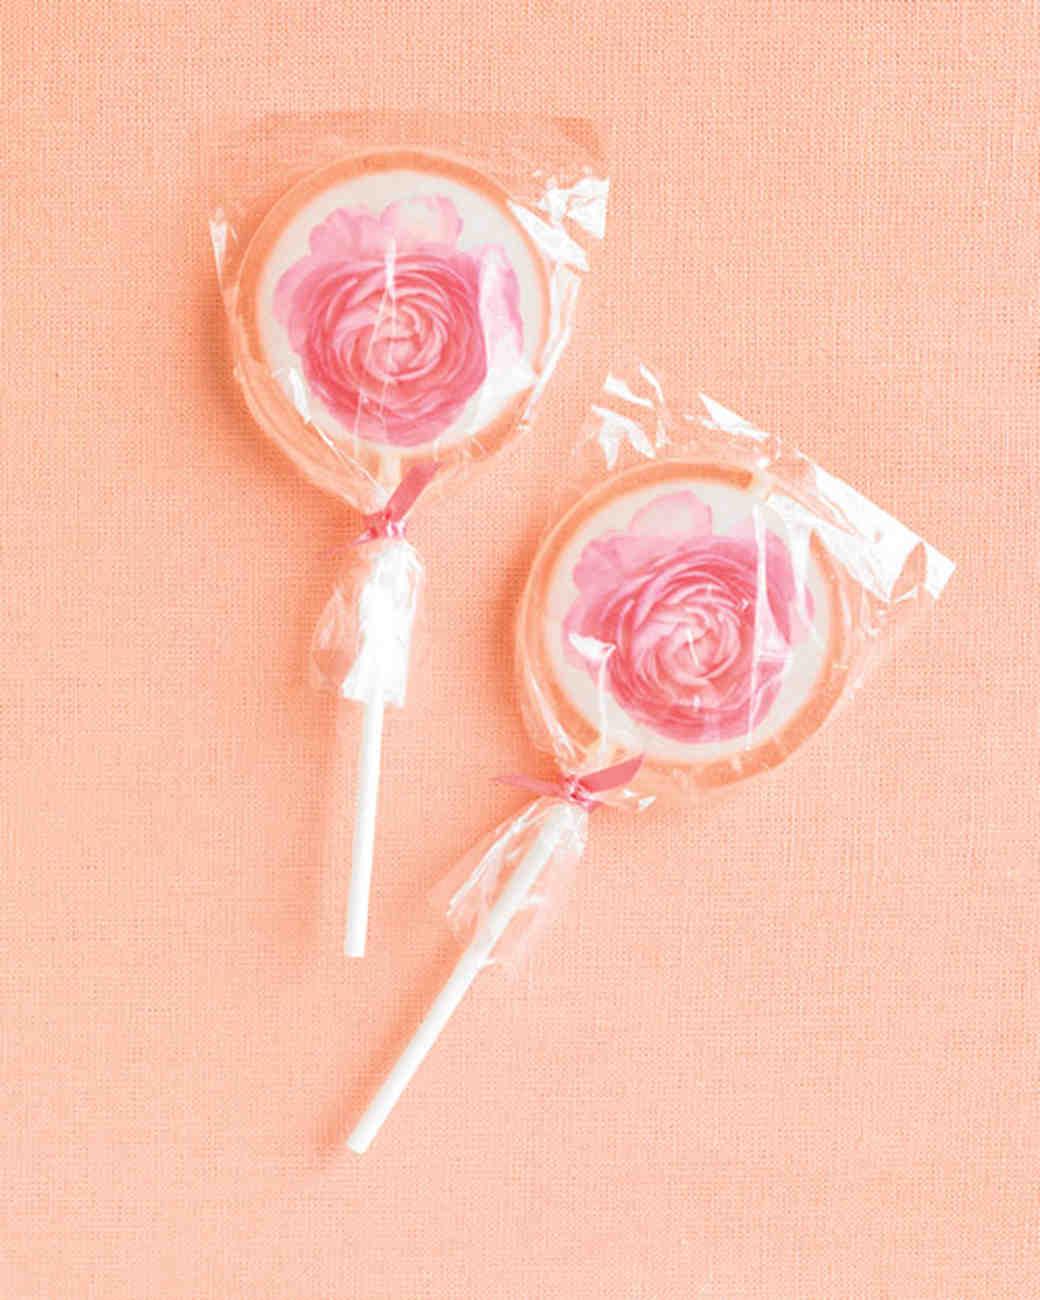 mwd105655_sum10_lollipop2.jpg